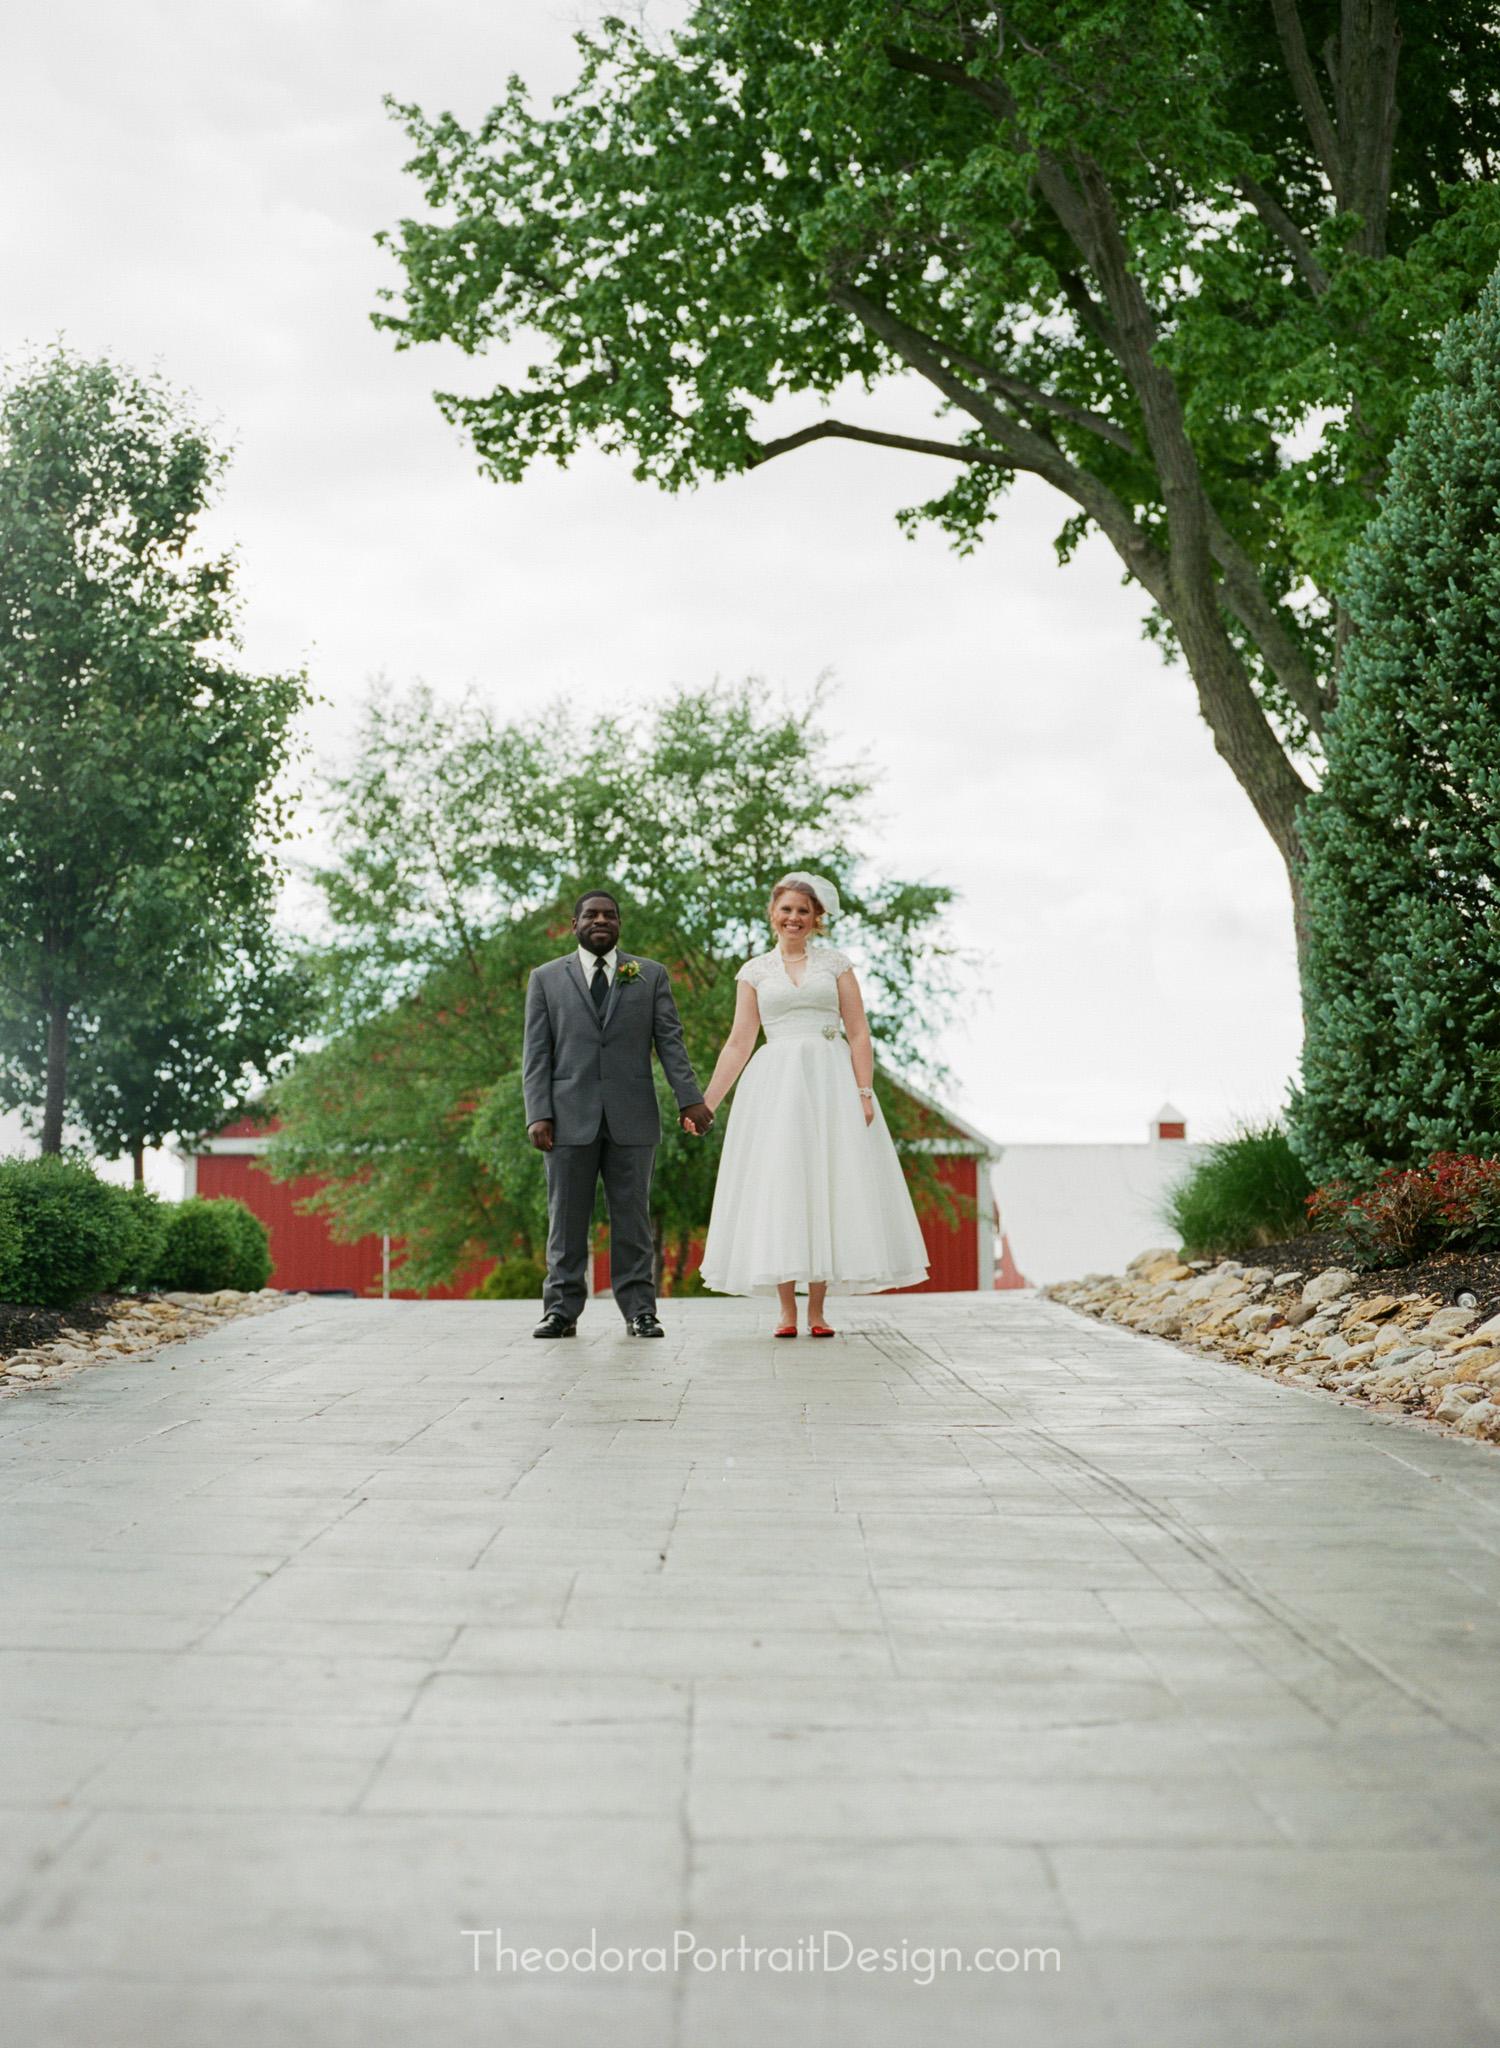 bride and groom     www.TheodoraPortraitDesign.com   film wedding photography